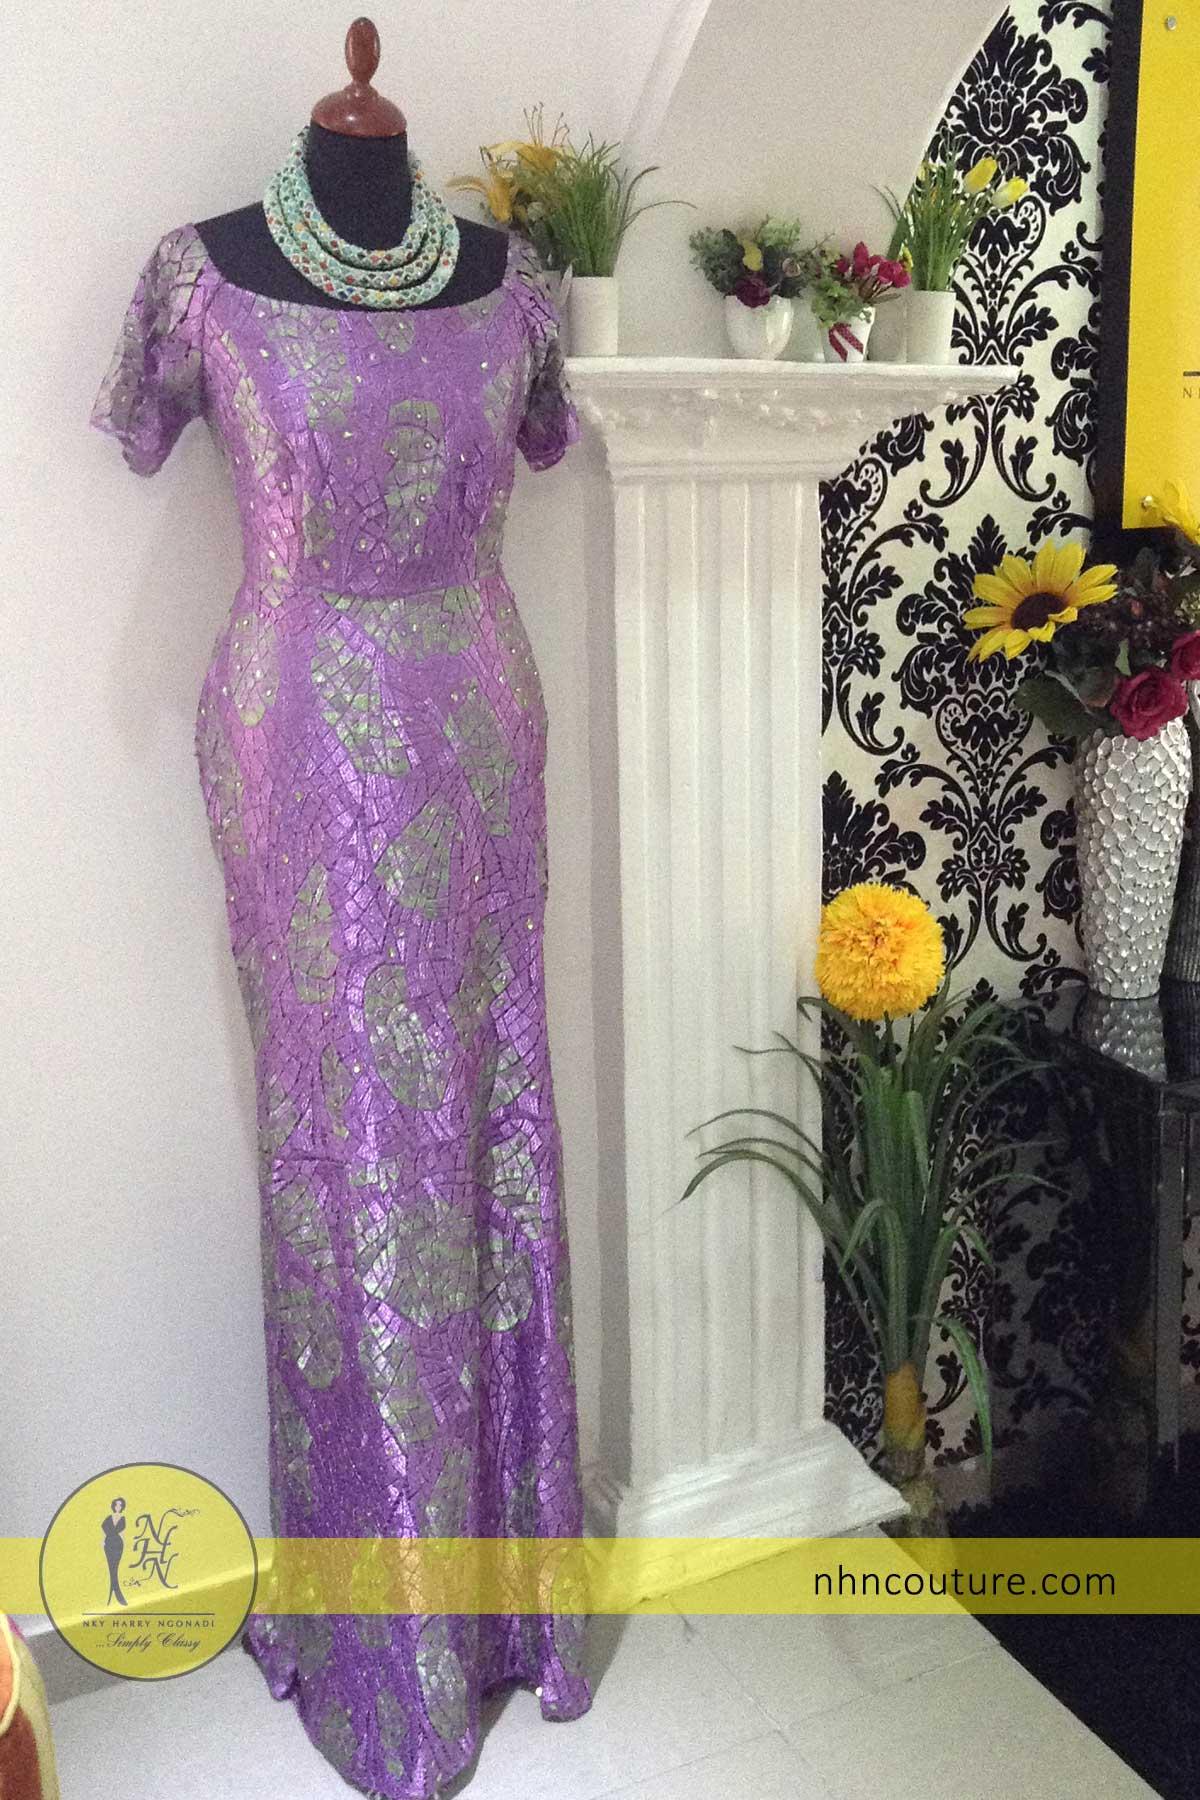 NHN-Couture_ready-to-wear_purple-asoebi_nigerian-traditional-attire